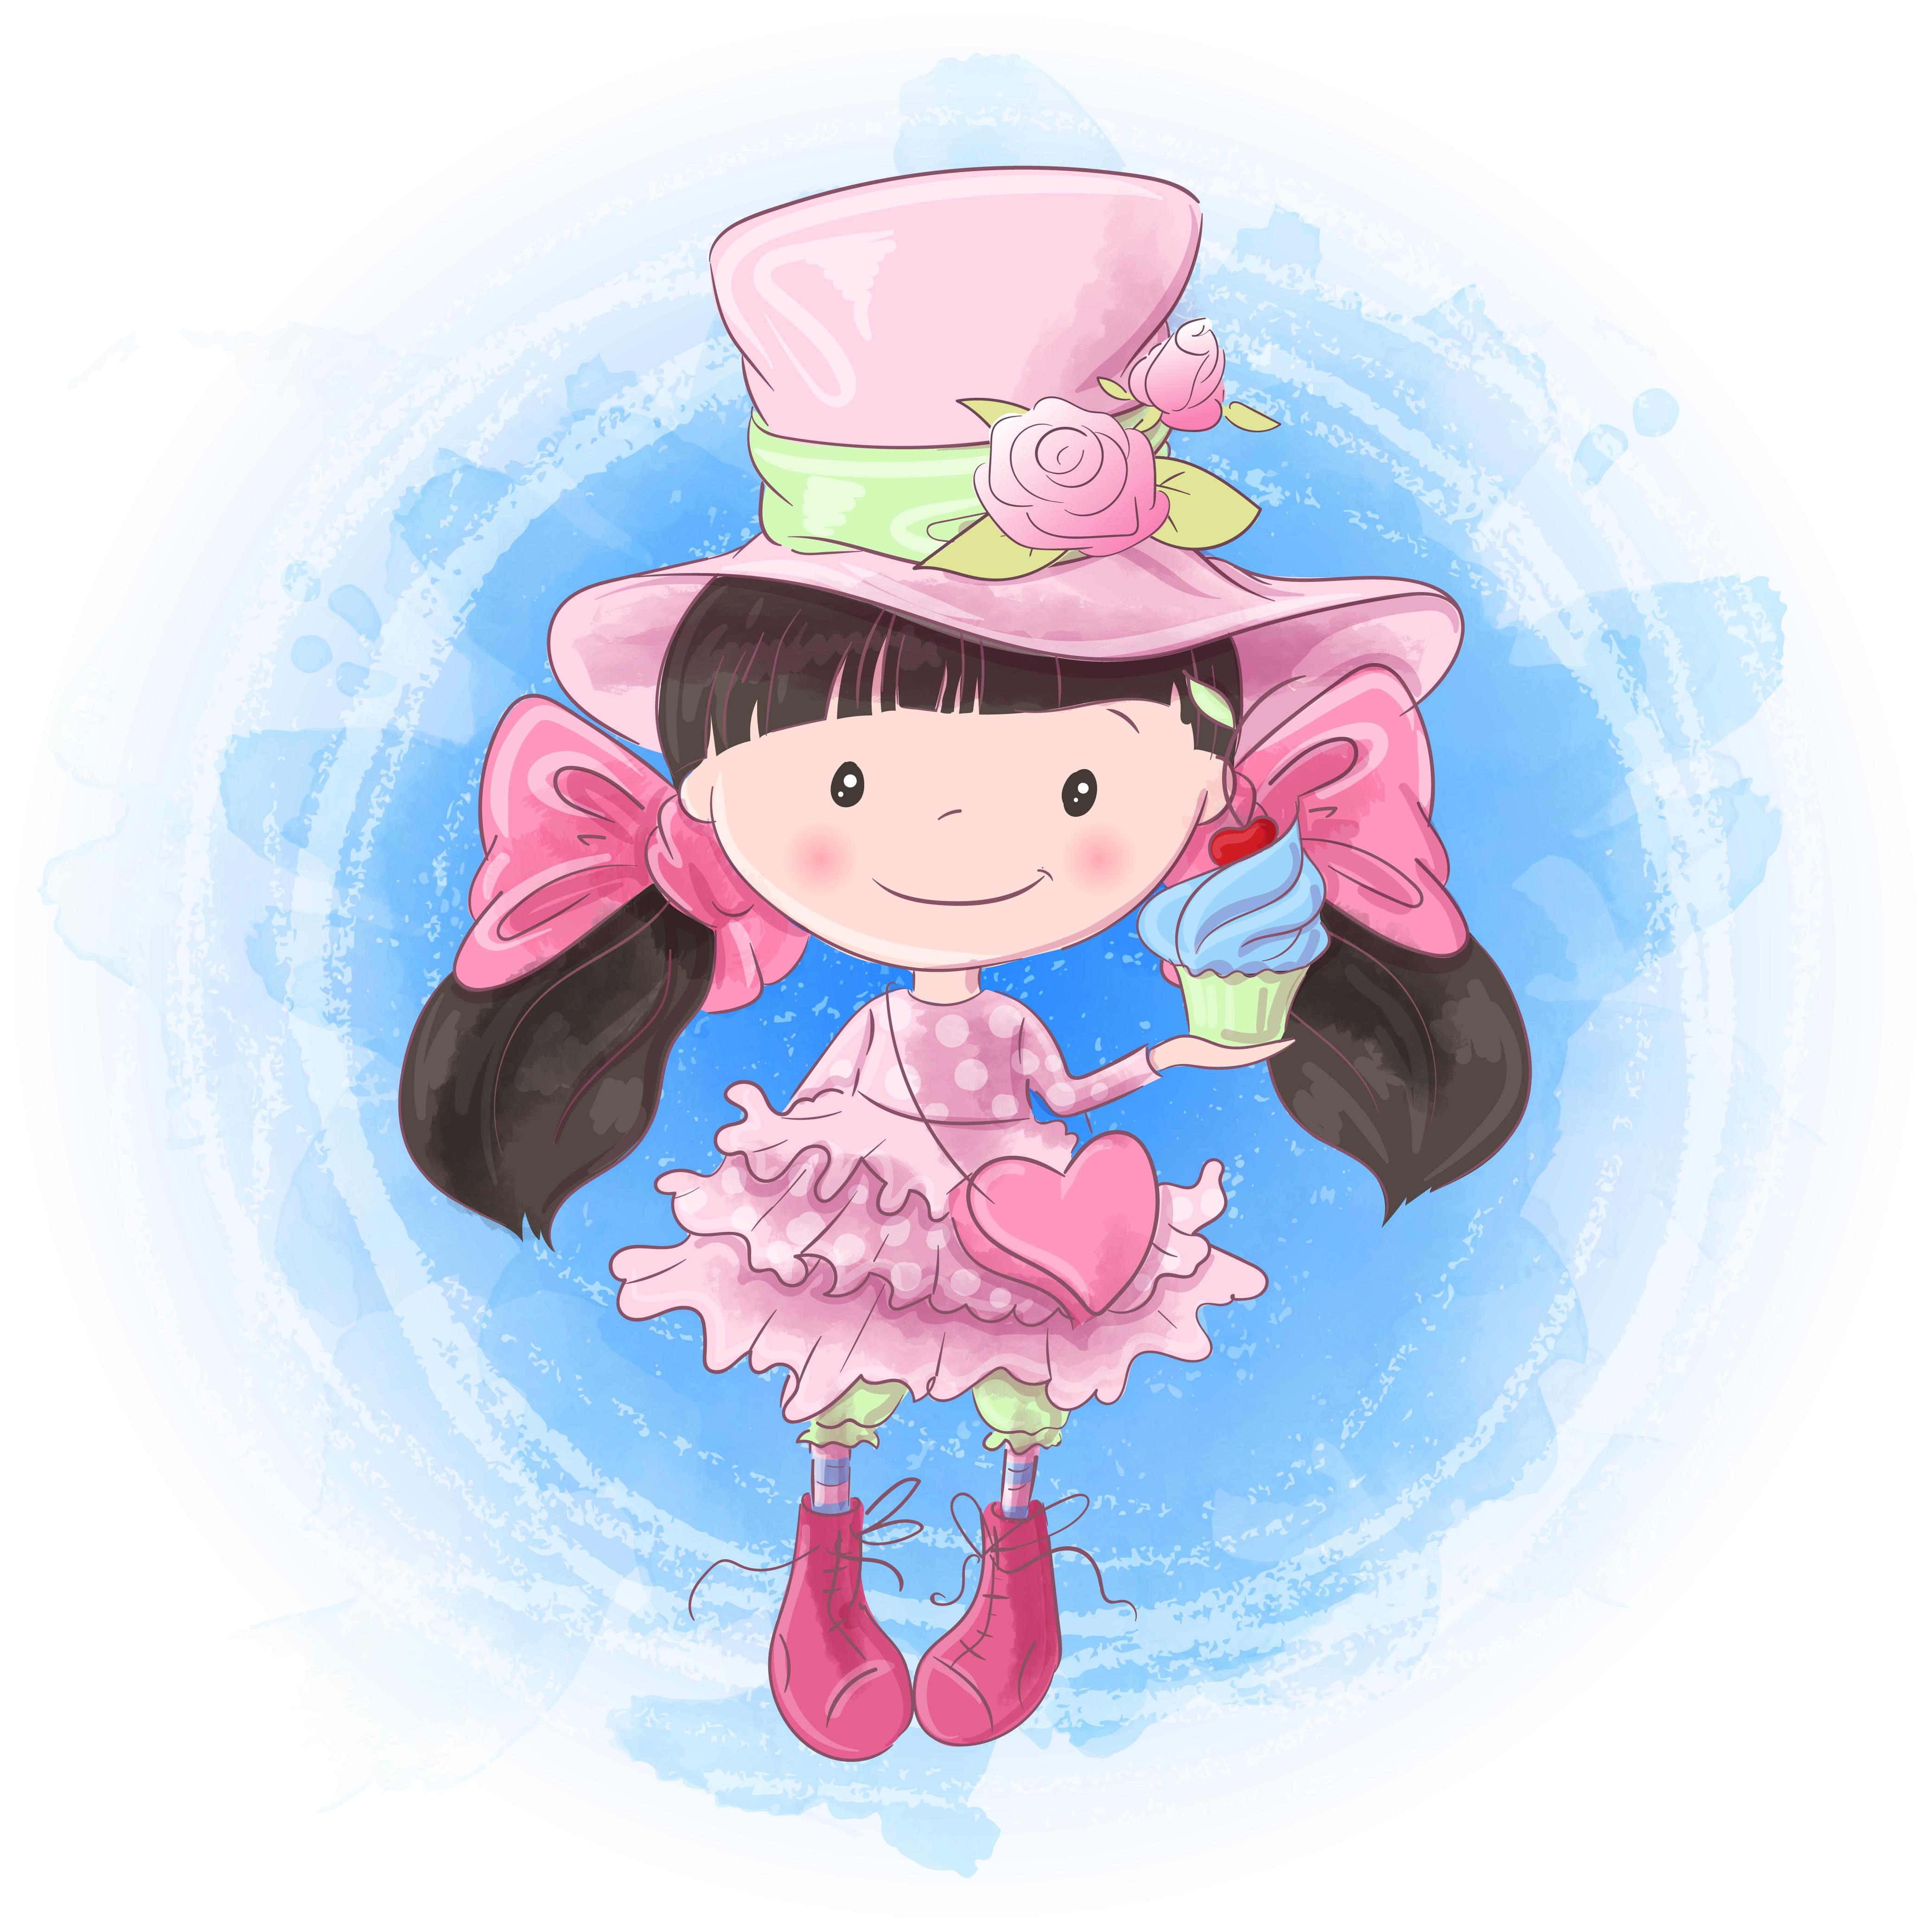 Cute Cartoon Girl Hand Drawing Vector Illustration Download Free